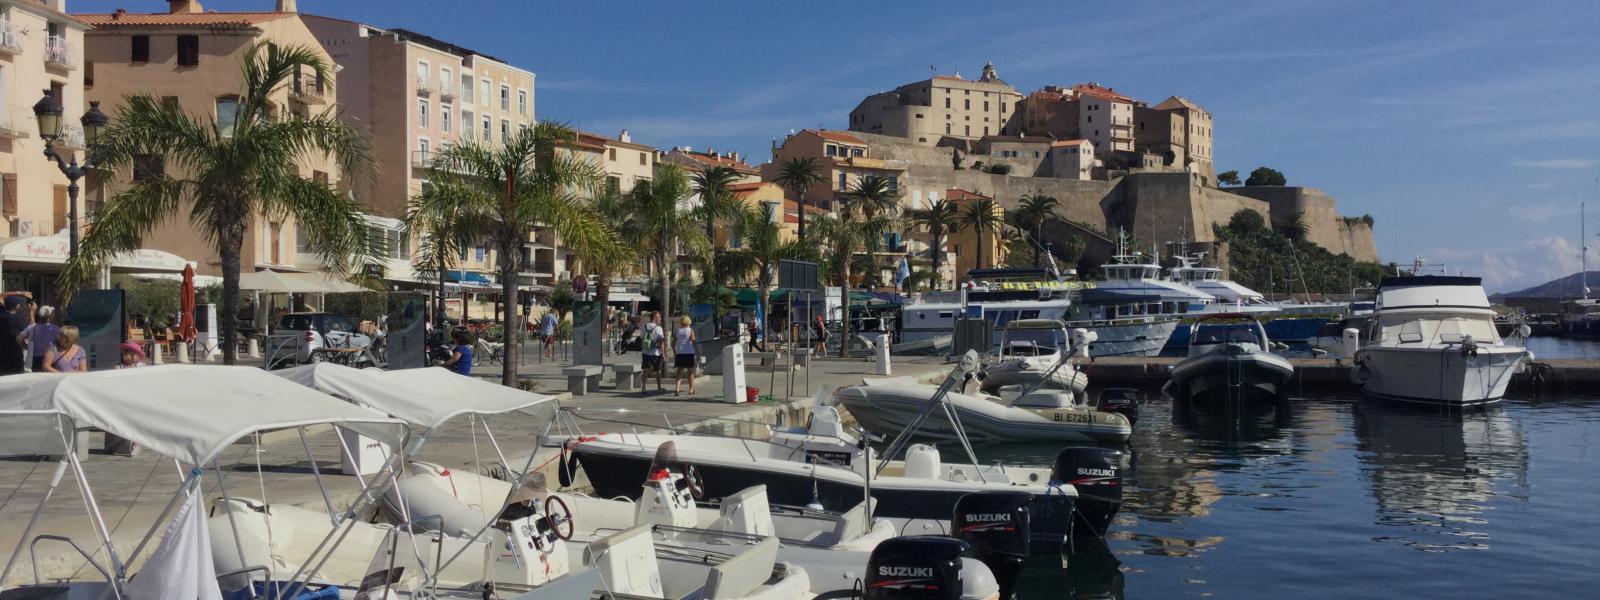 Calvi, het Knokke van Corsica - www.deglobetrotter.be